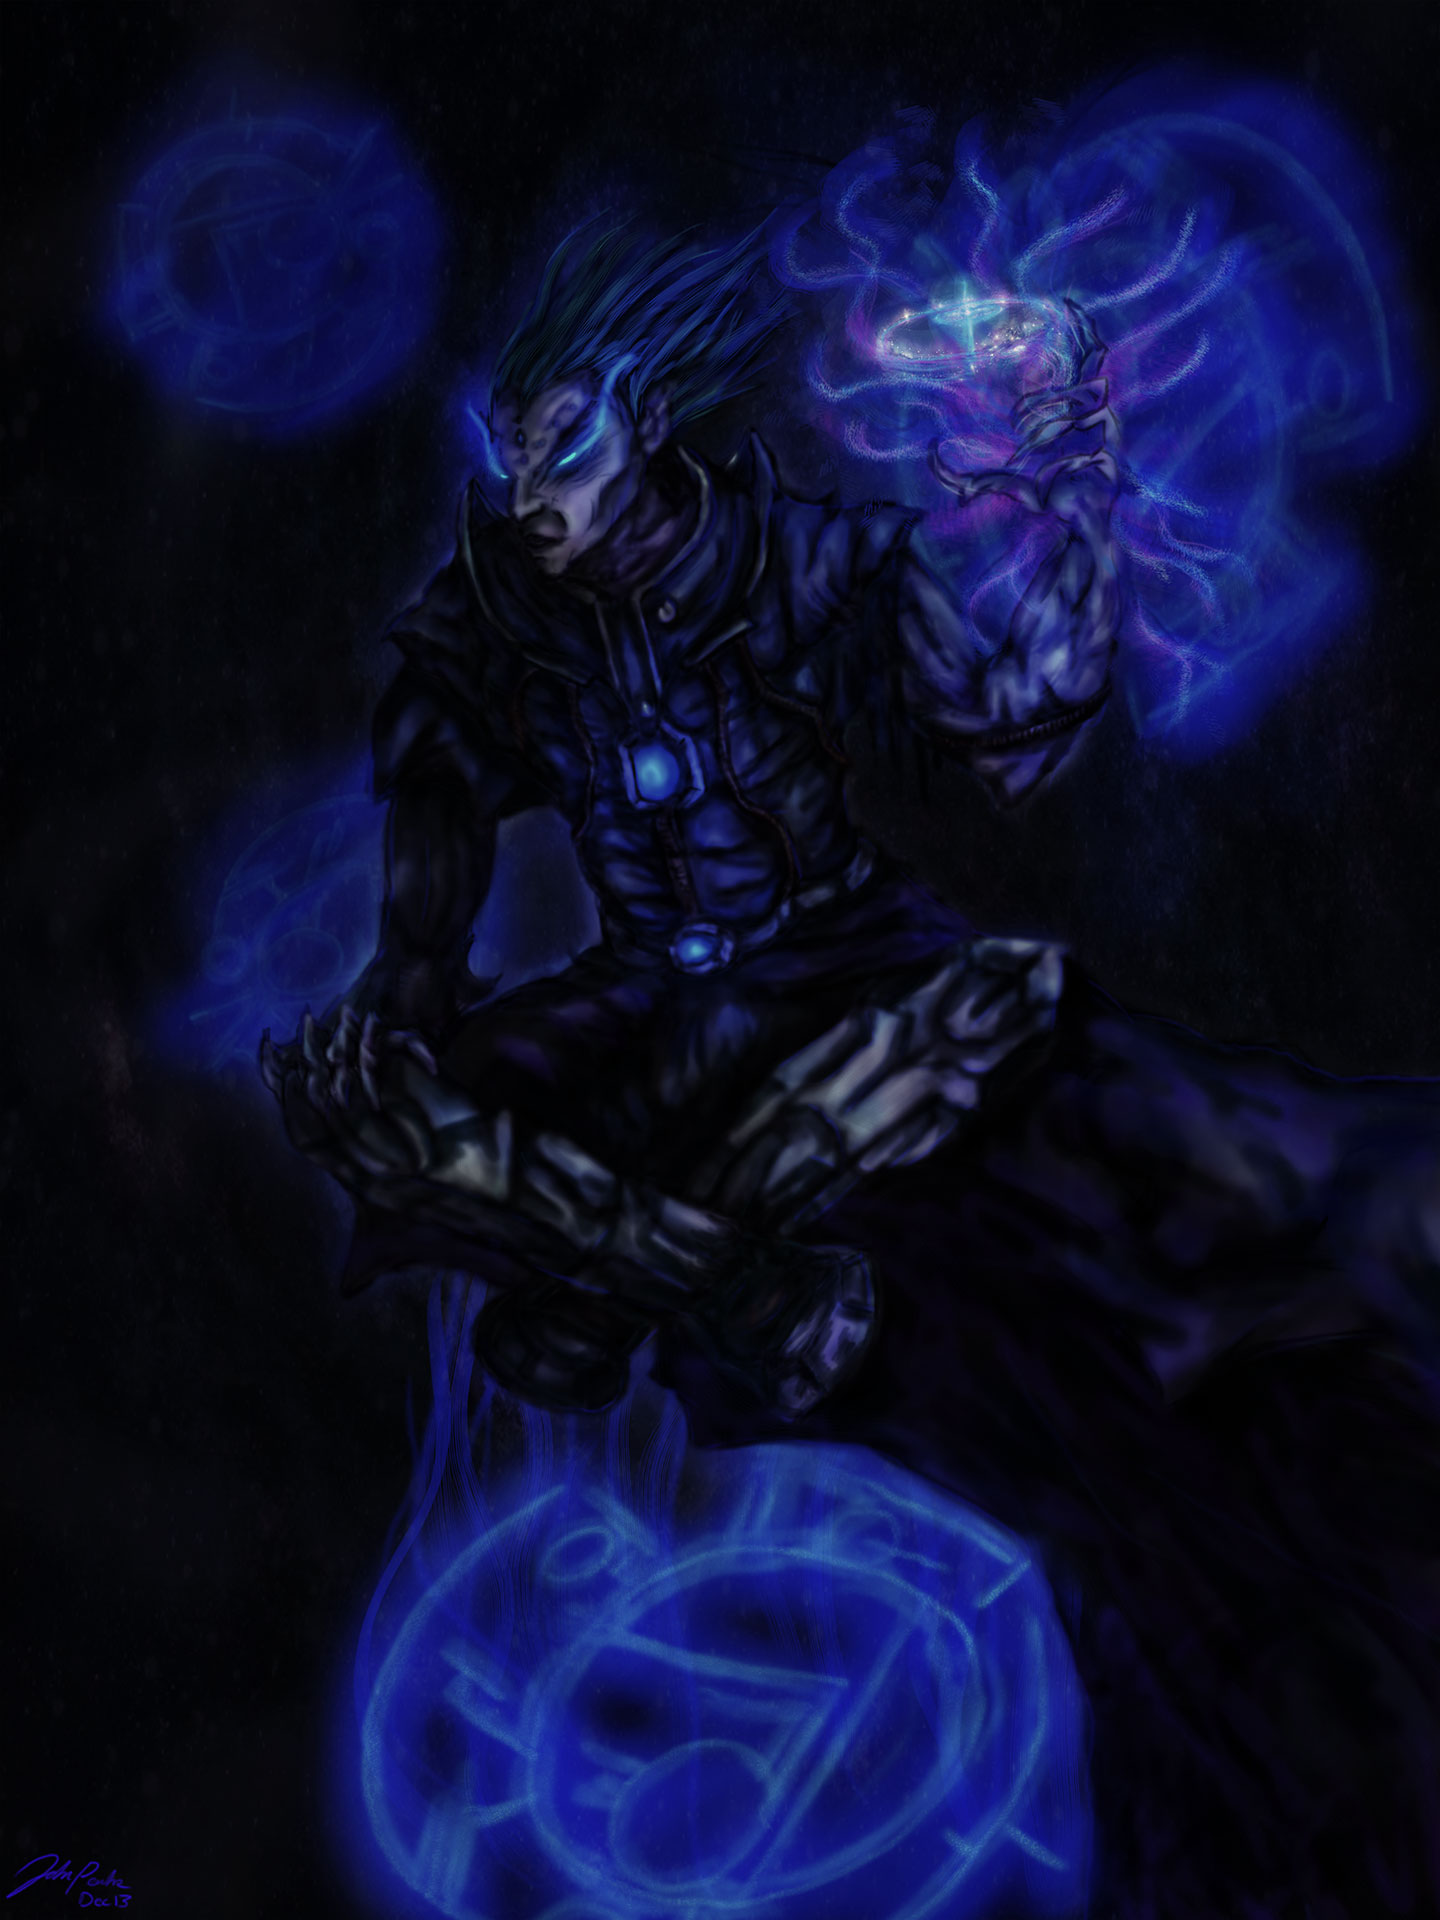 astromancer_by_nydrogote_d6zej44